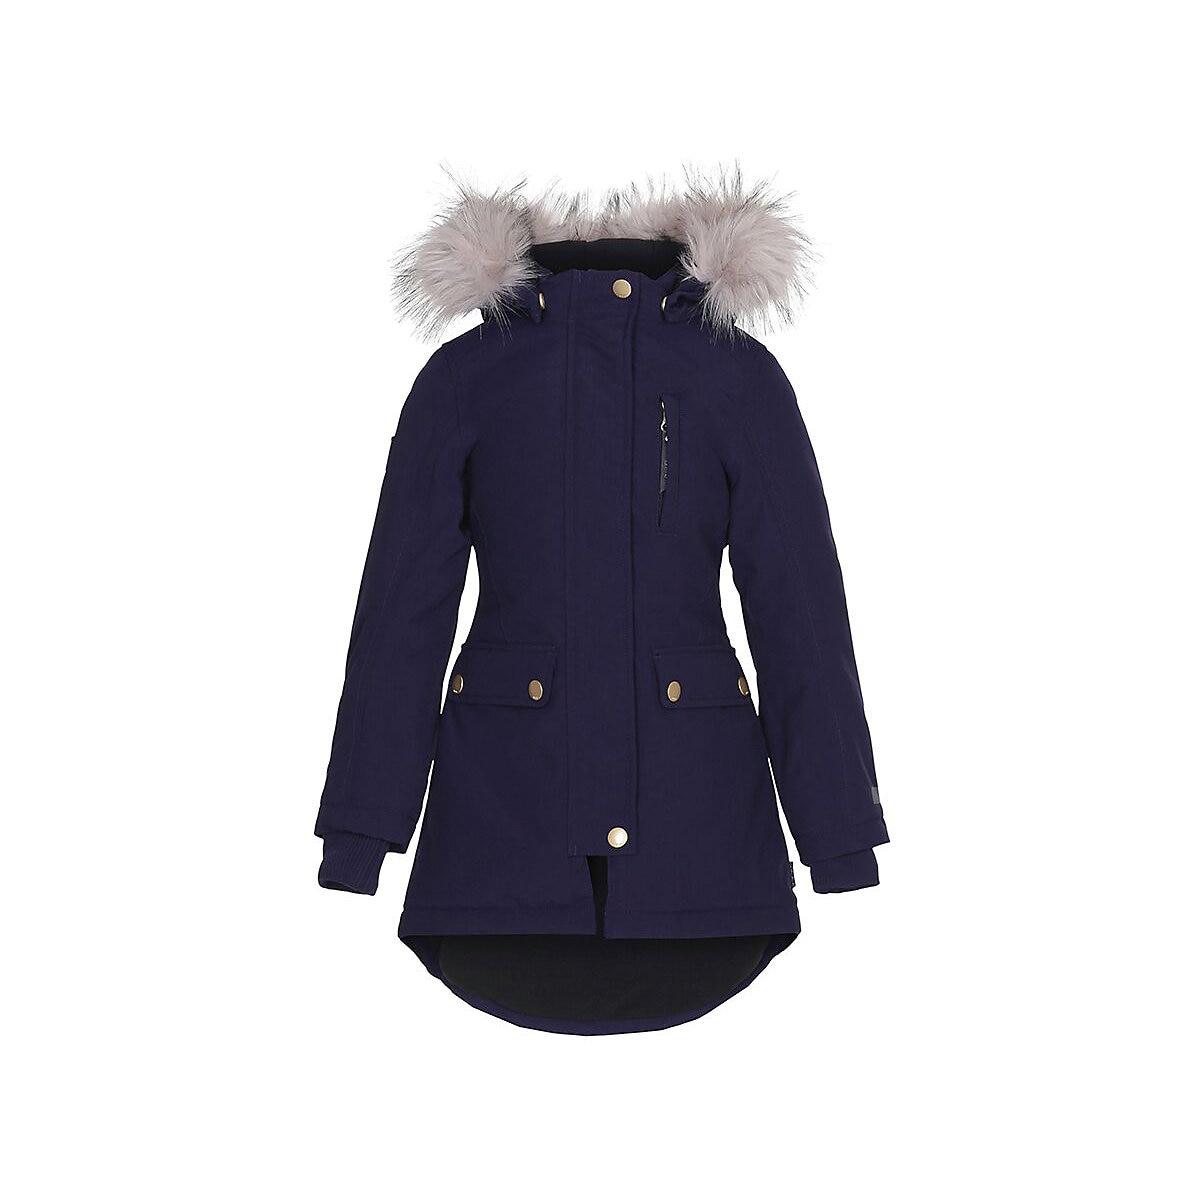 Jackets & Coats MOLO for girls 9170631 Jacket Coat Denim Cardigan Warm Children clothes Kids MTpromo ribbed hem zip up denim jacket